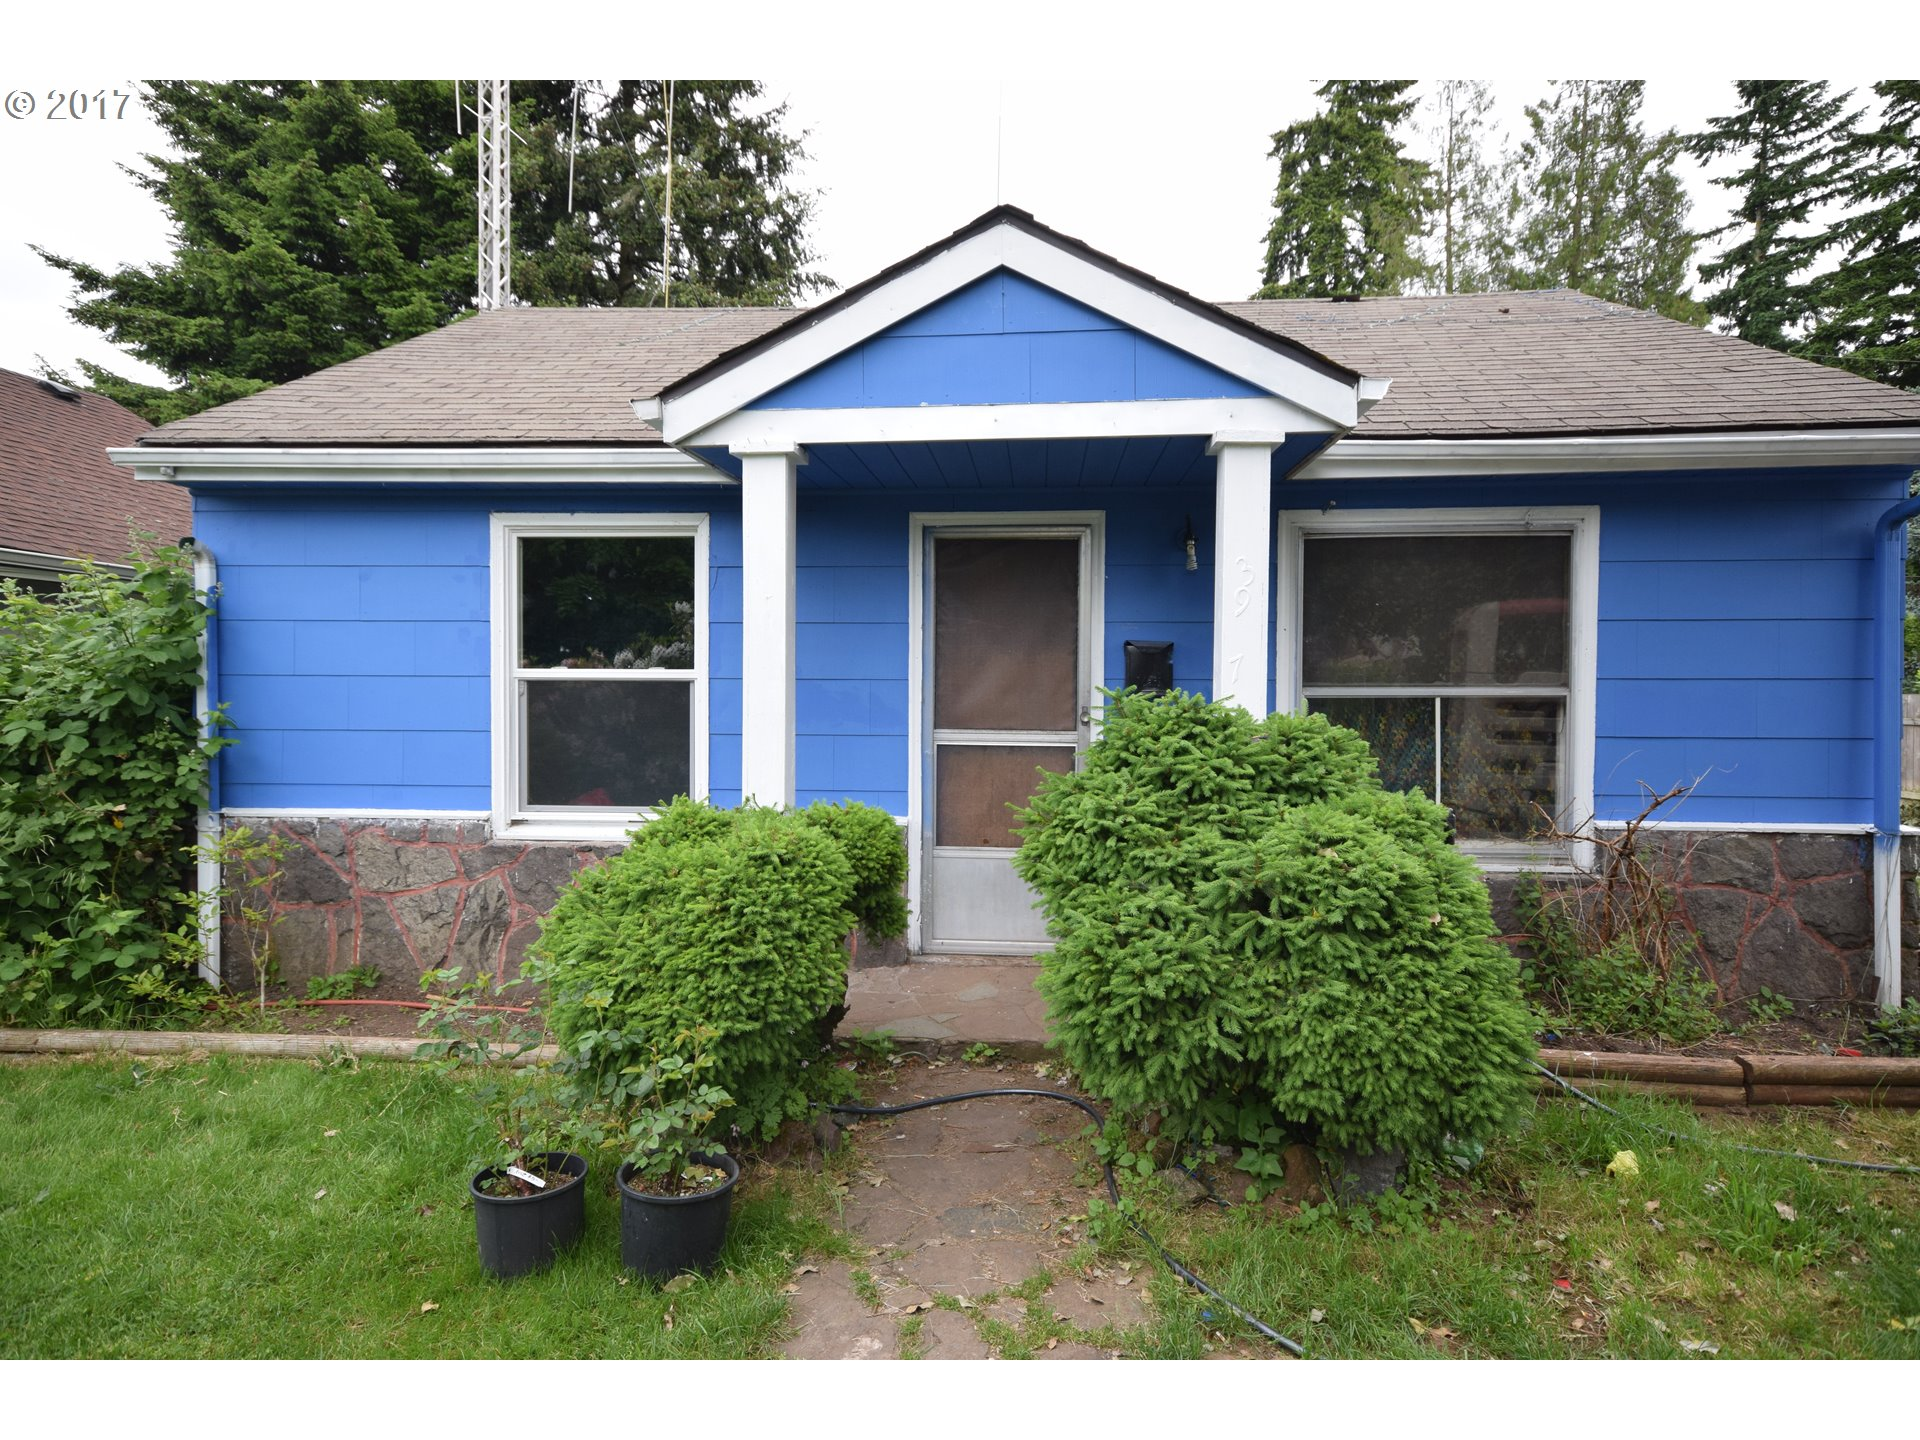 3917 F ST, Vancouver, WA 98663